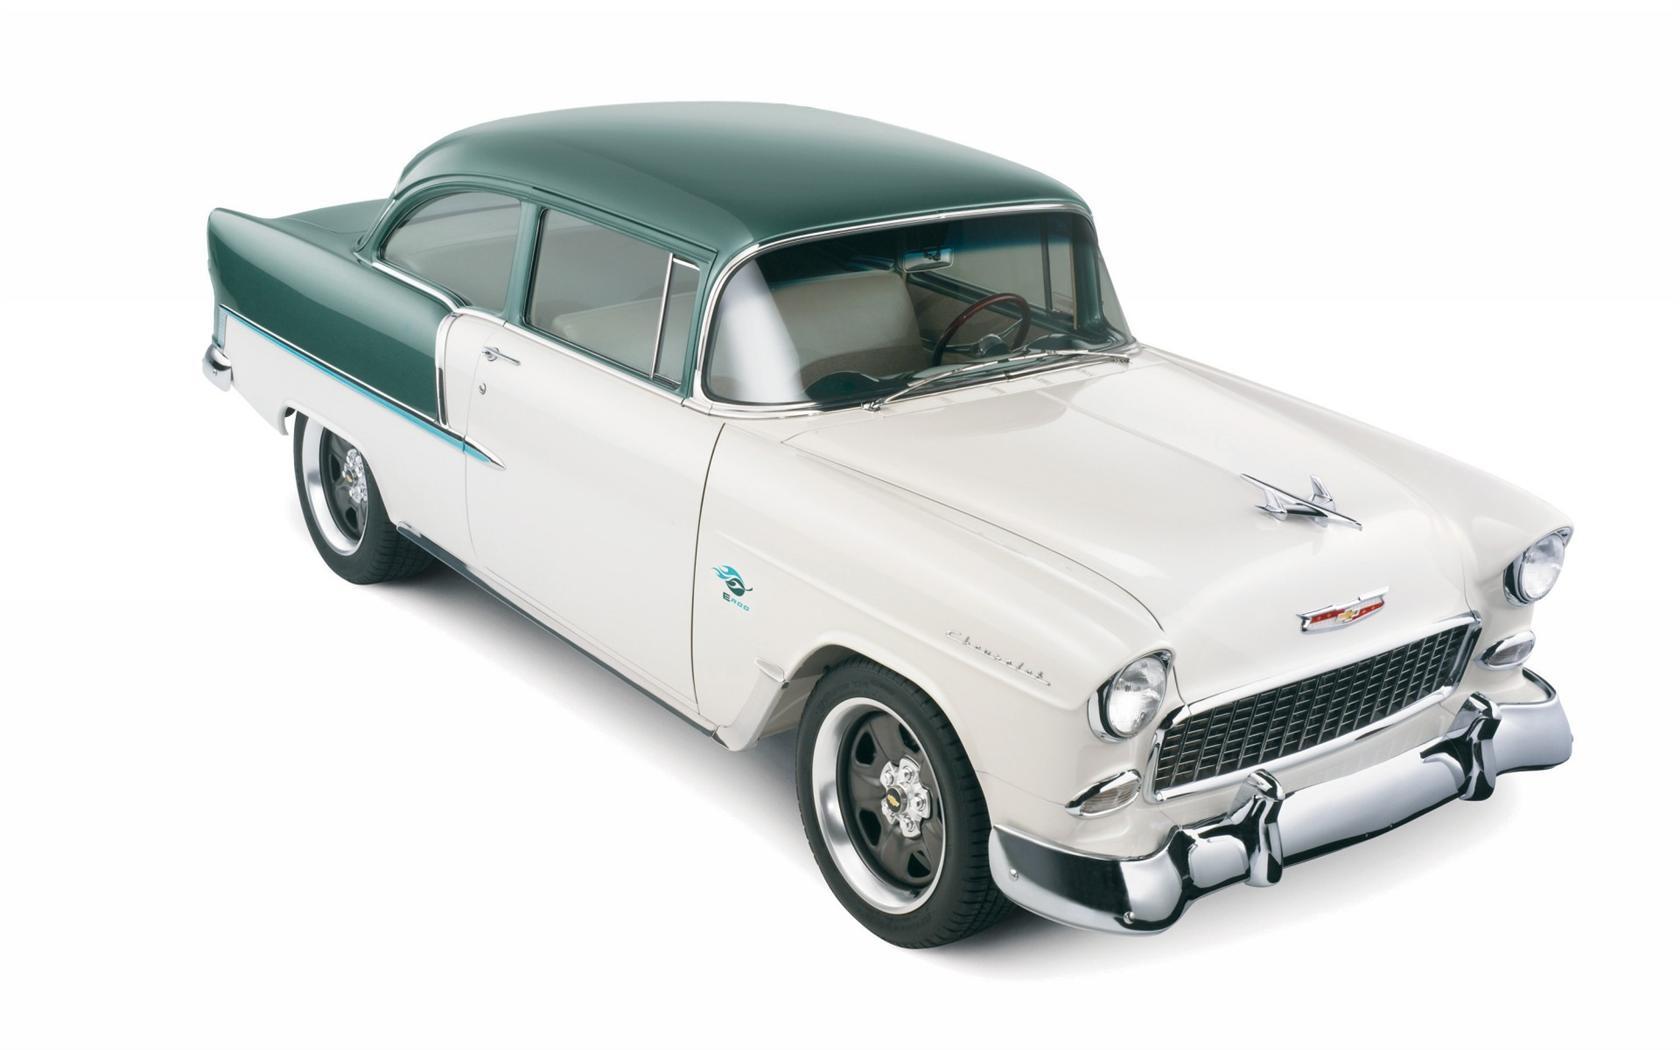 1955 Chevrolet E-ROD Bel Air